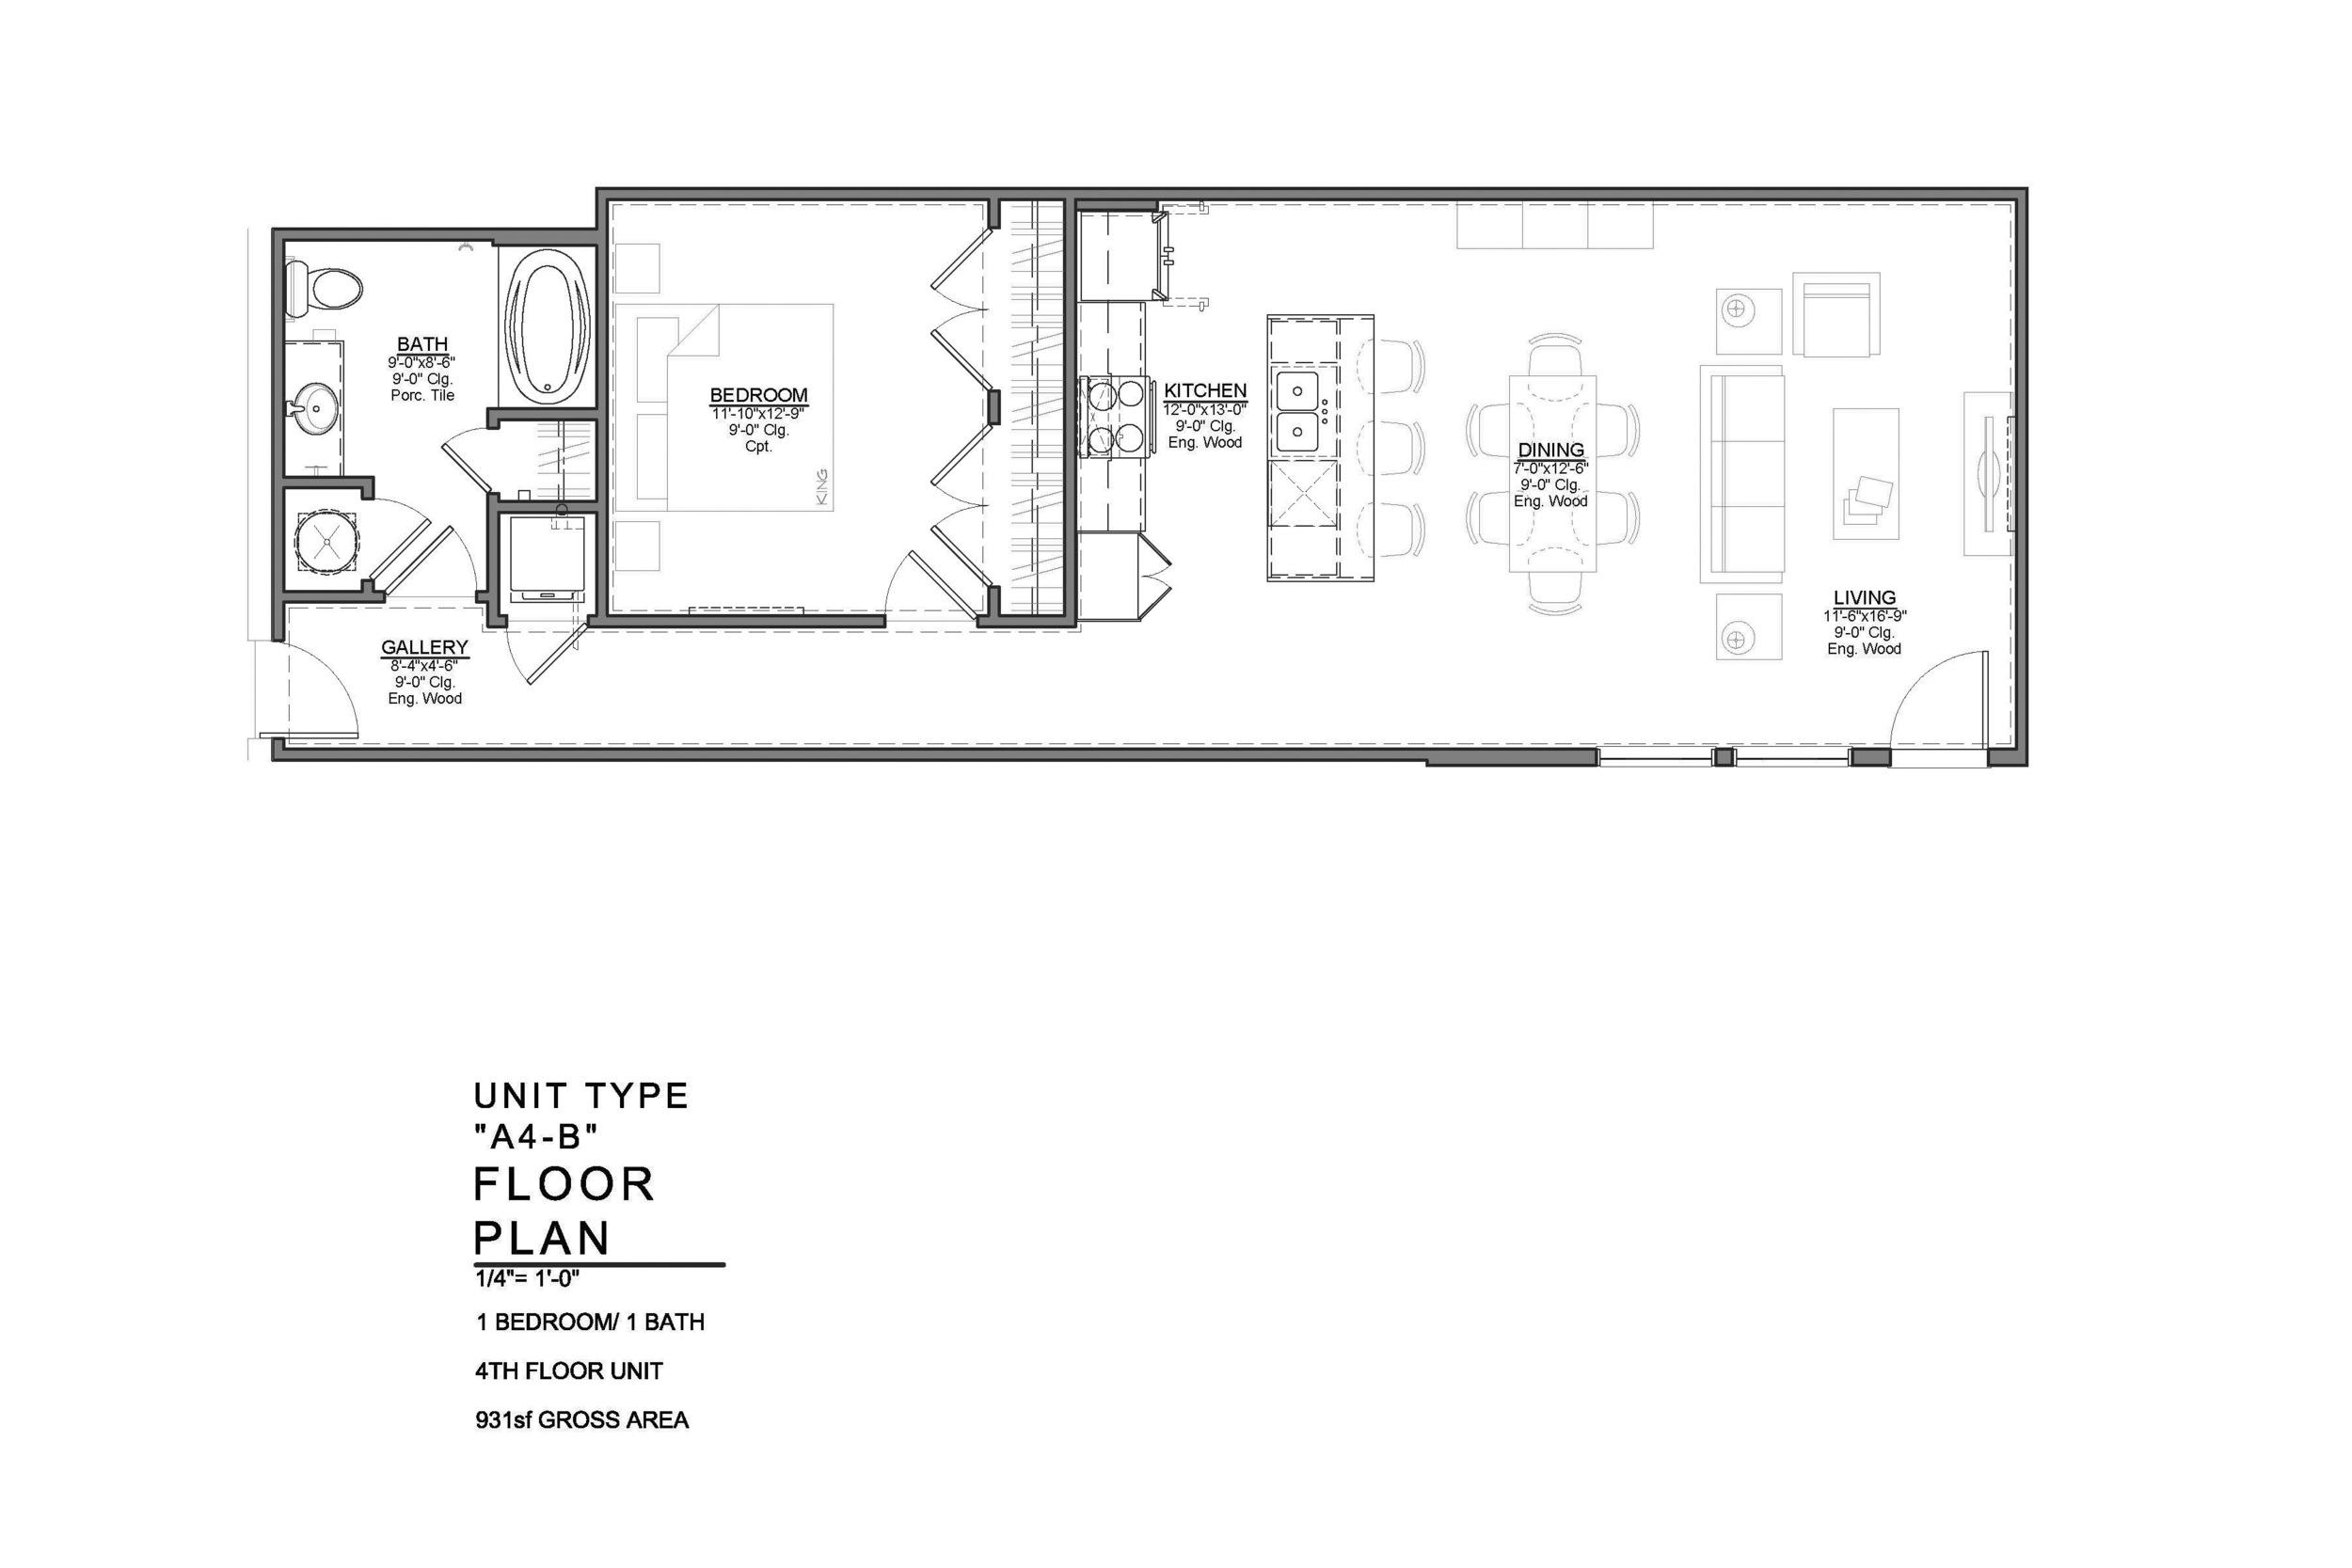 A4-B FLOOR PLAN: 1 BEDROOM / 1 BATH